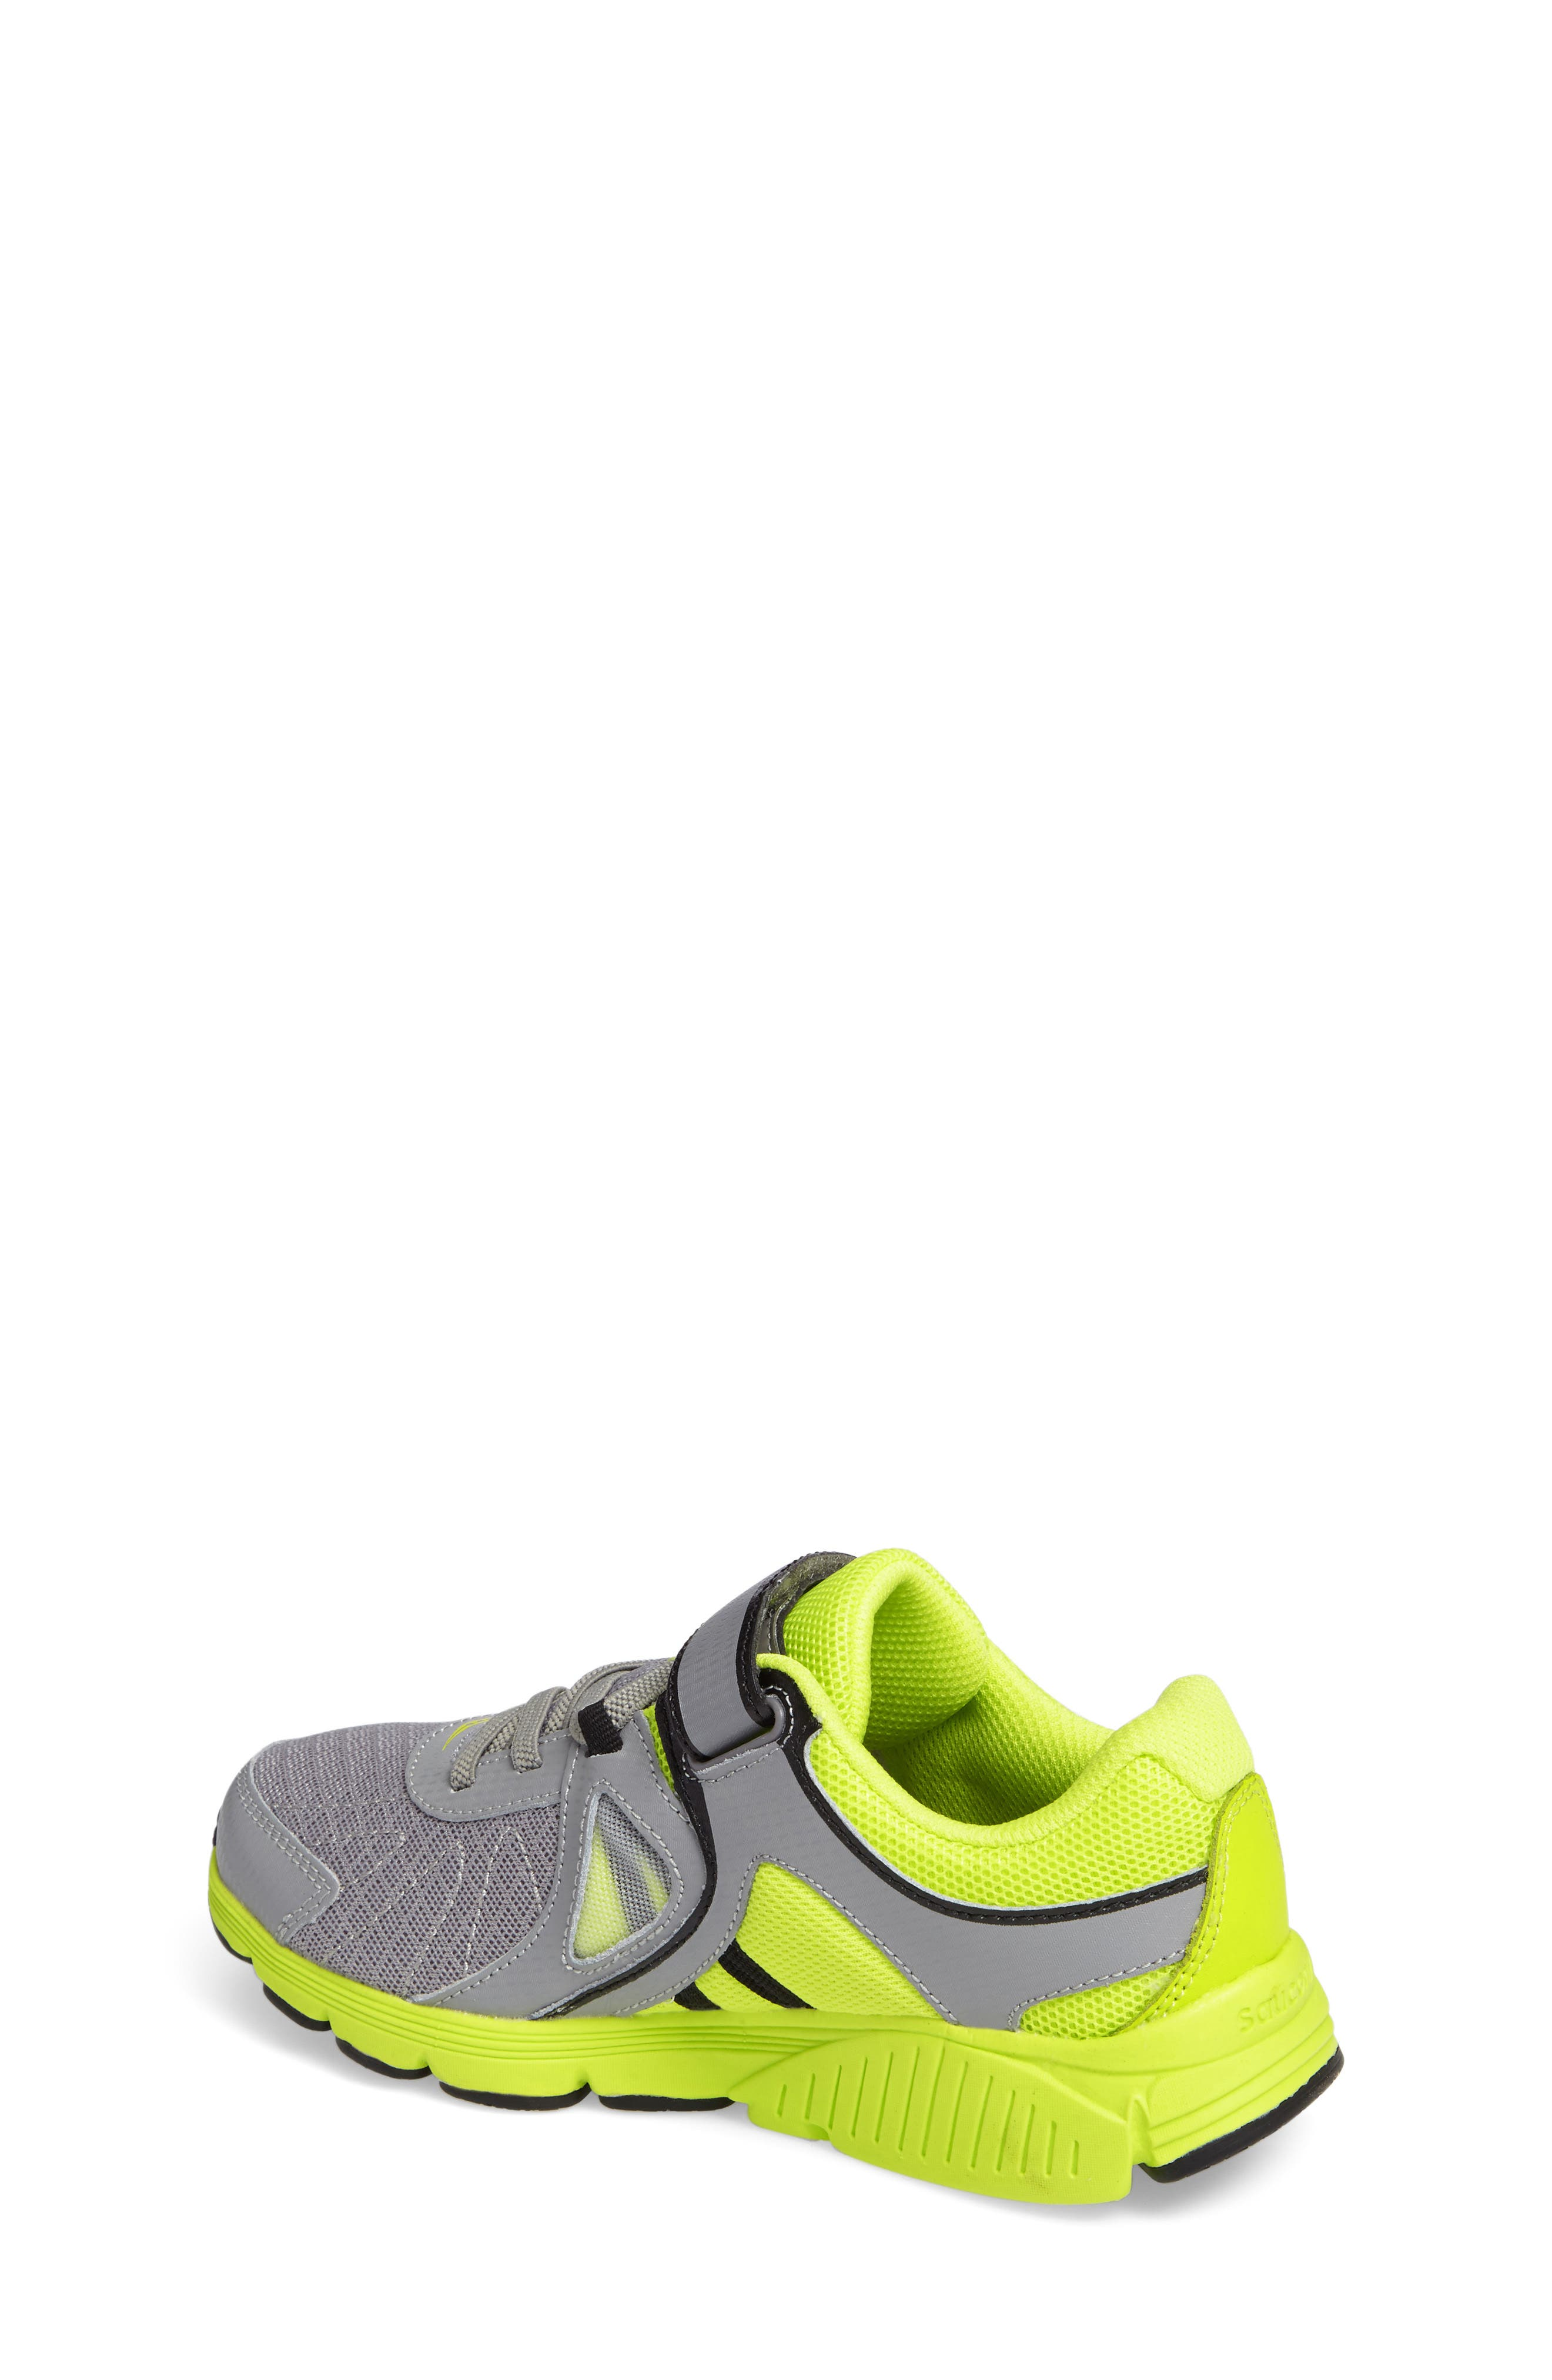 Kotaro 3 A/C Athletic Sneaker,                             Alternate thumbnail 2, color,                             Grey/ Lime